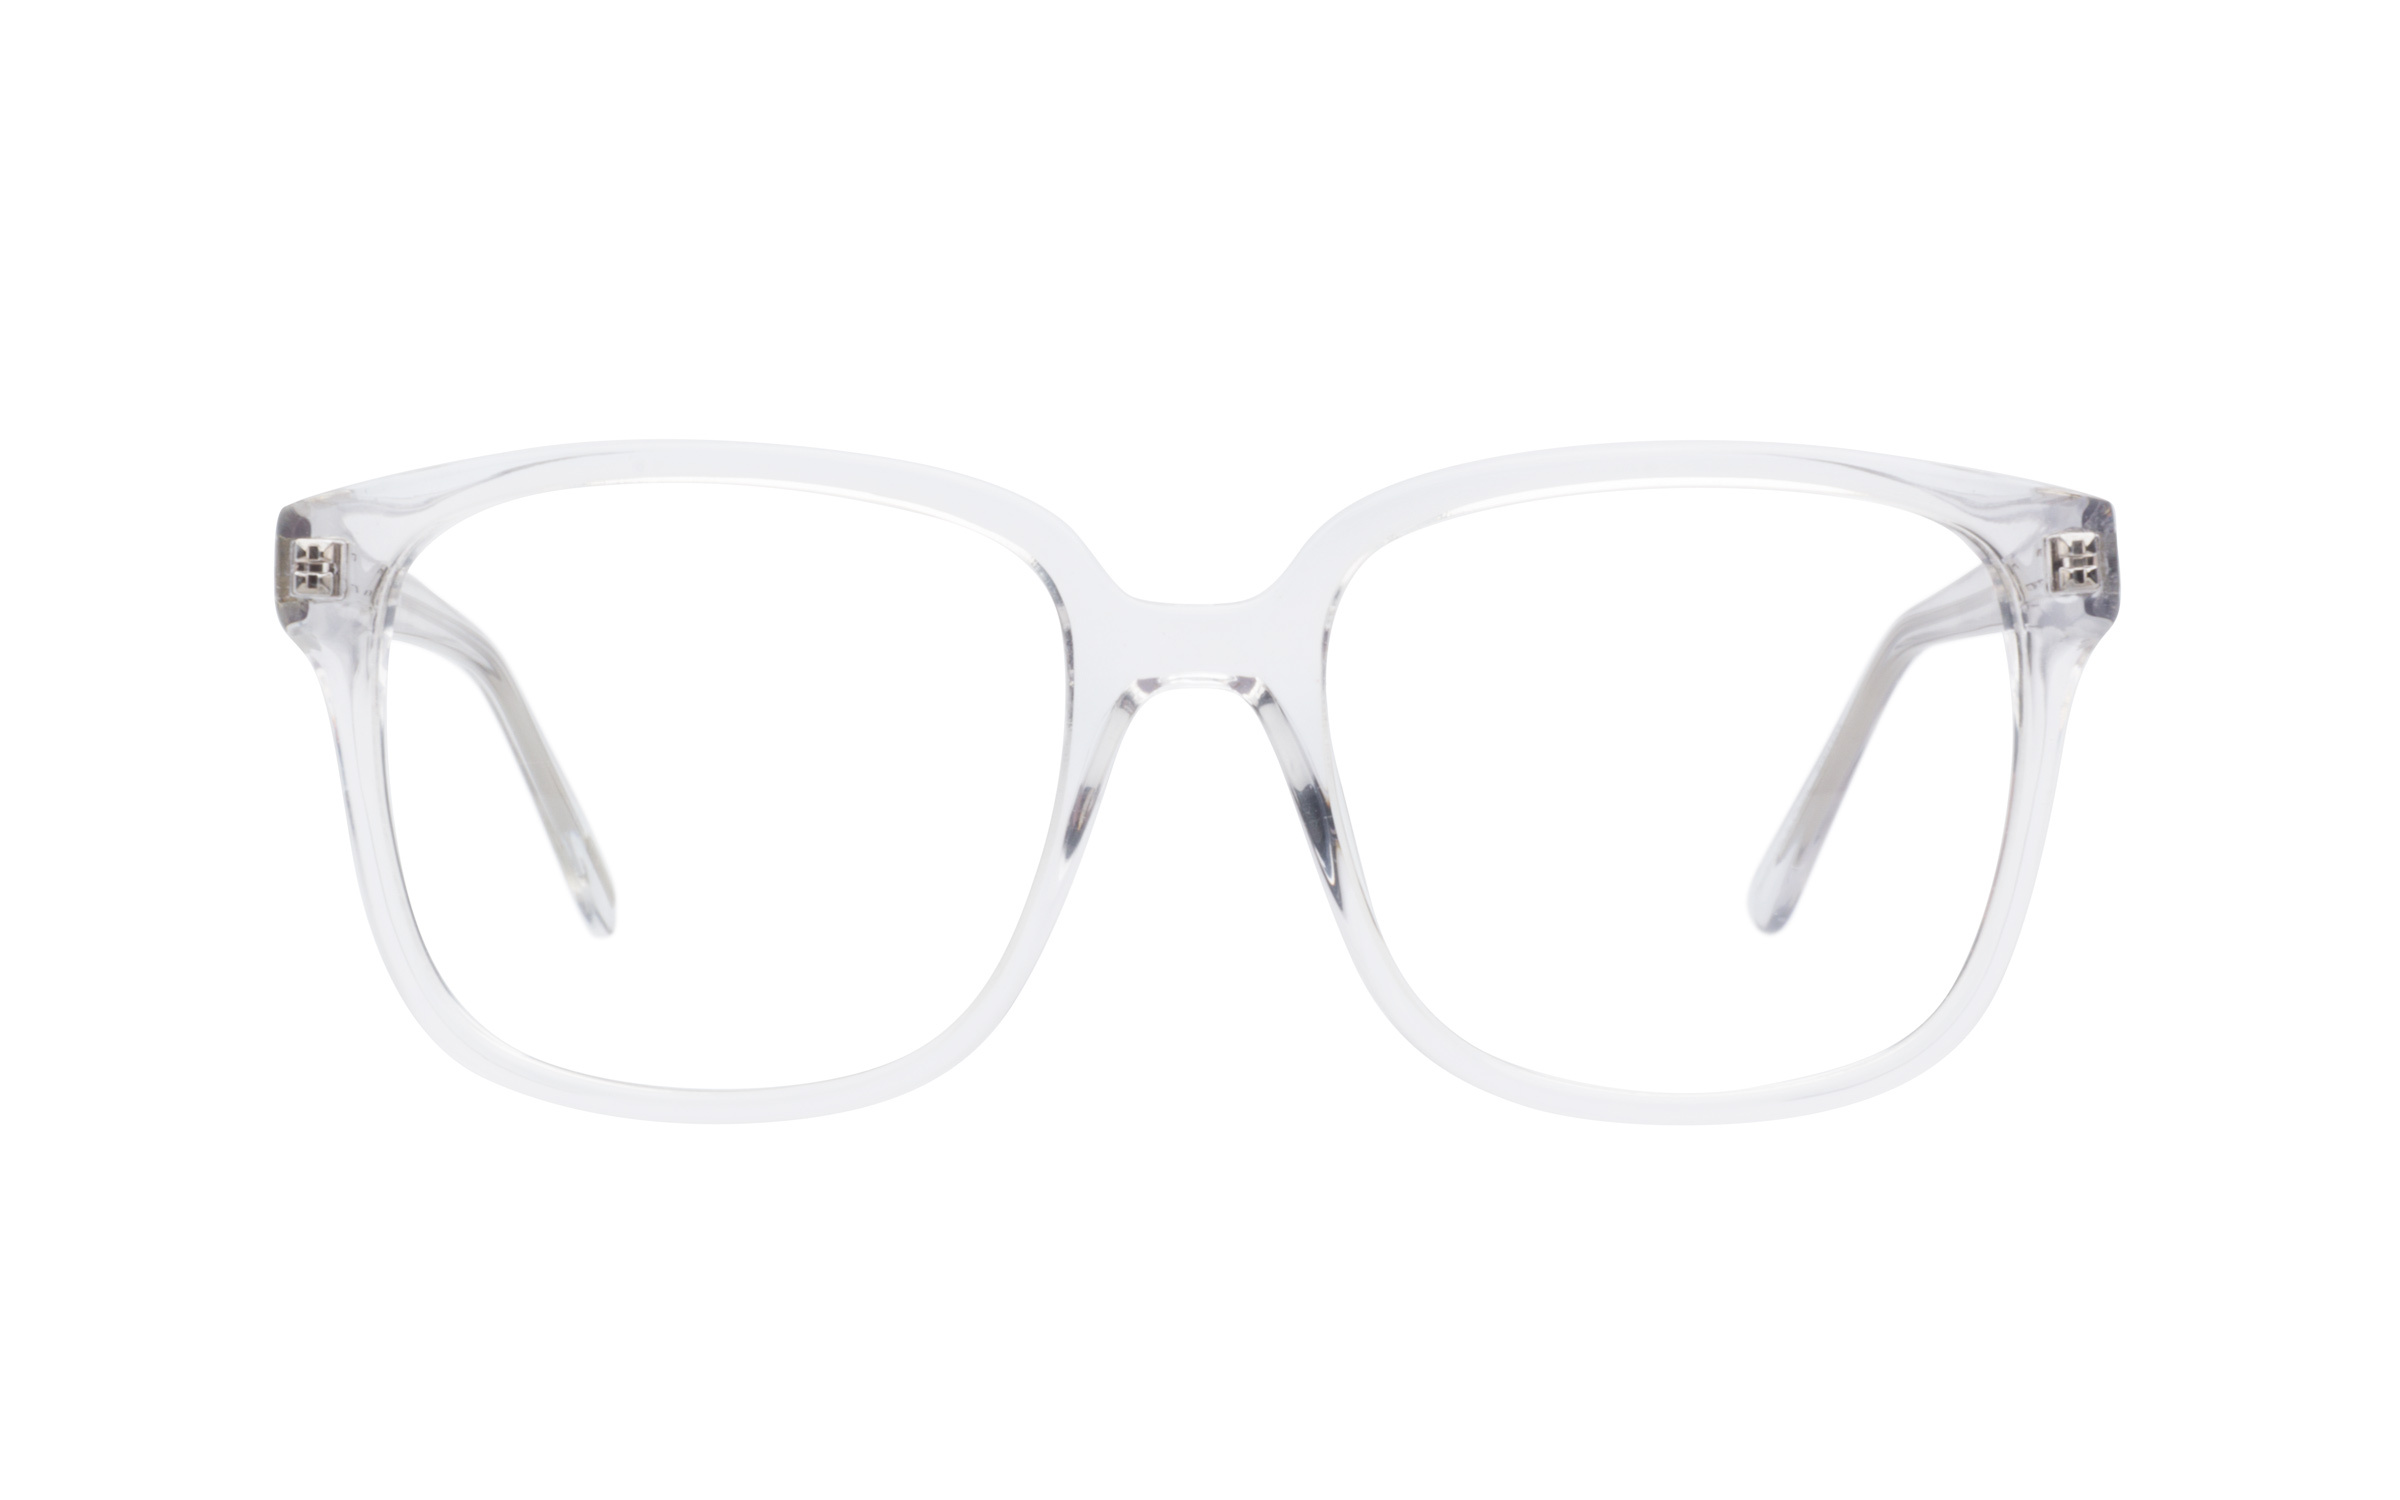 Kam_Dhillon_Womens_Glasses_Retro_Clear_Acetate_Online_Coastal